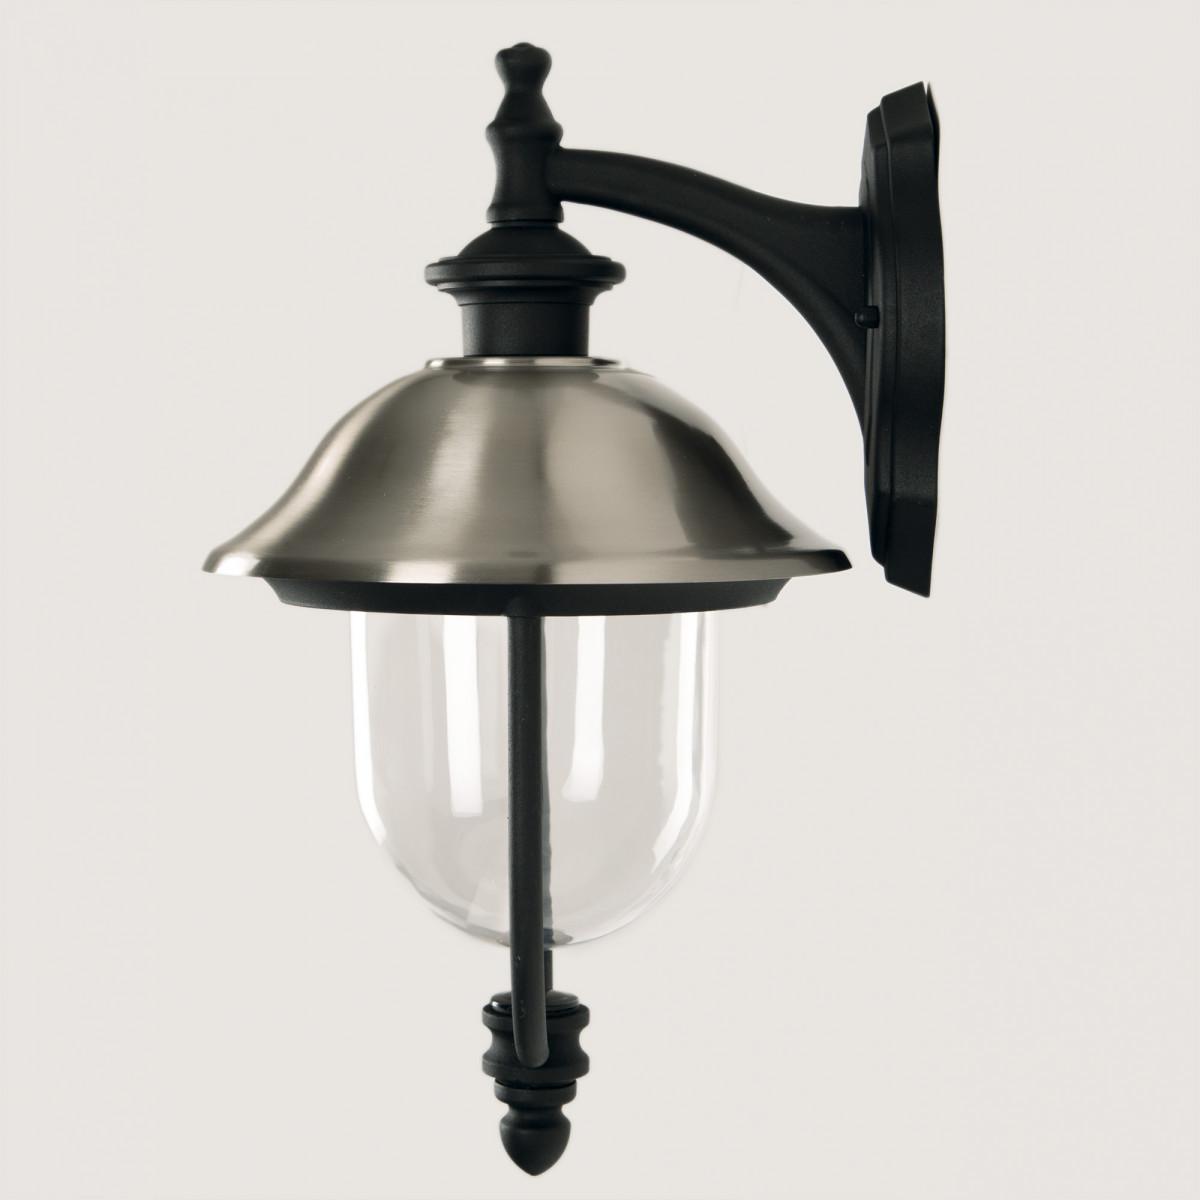 Bologna hang (7419) - KS Verlichting - Buitenverlichting Rond